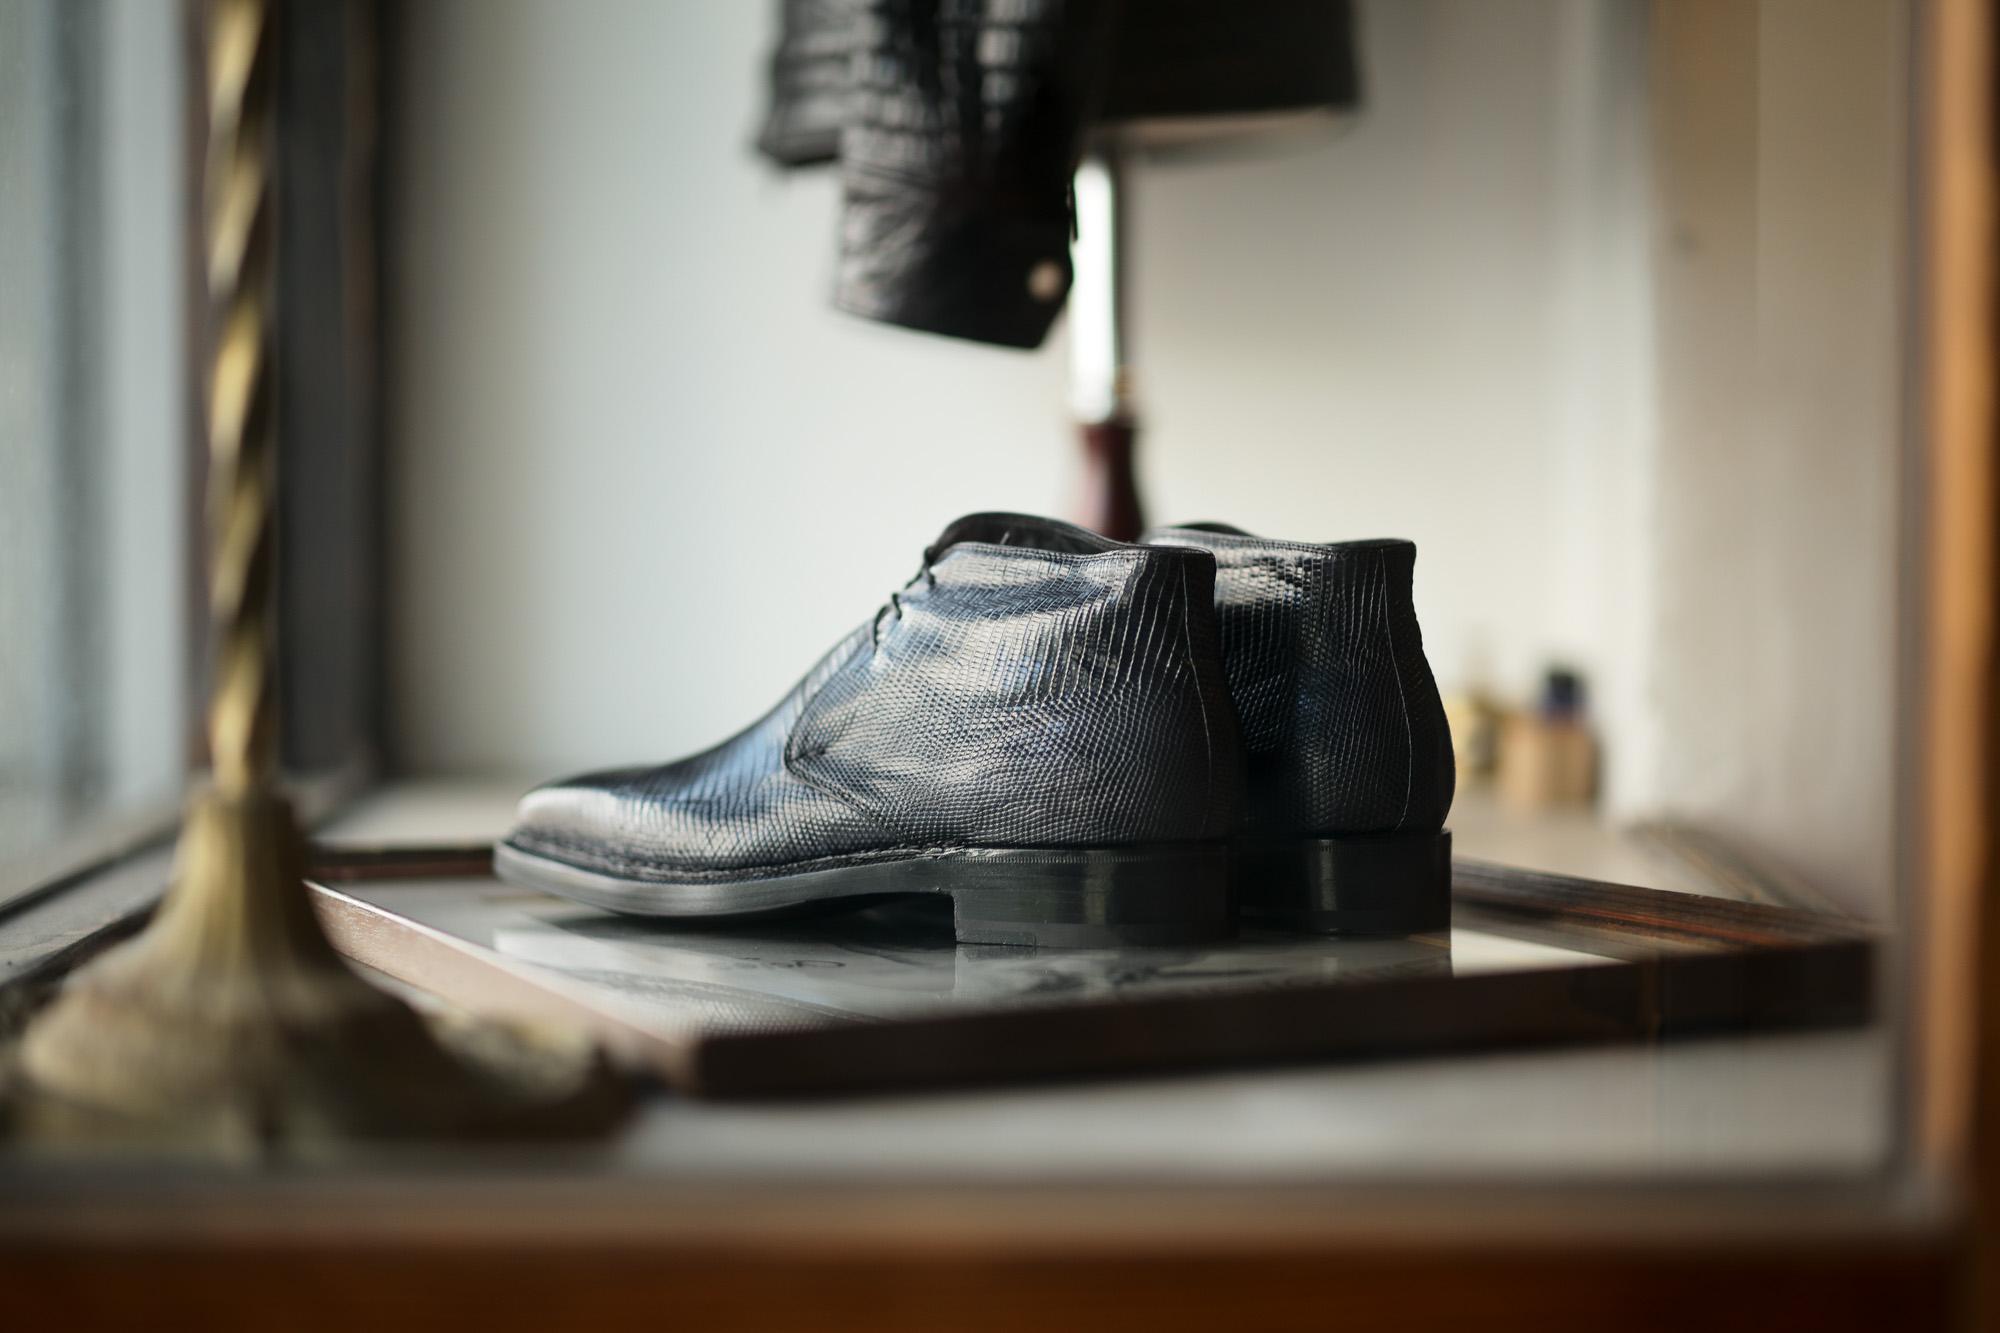 ENZO BONAFE (エンツォボナフェ) ART.3722 Chukka boots Lizard Leather リザード エキゾチックレザー チャッカブーツ BLUE (ブルー) made in italy (イタリア製) 2021 【Special Model】愛知 名古屋 Alto e Diritto altoediritto アルトエデリット